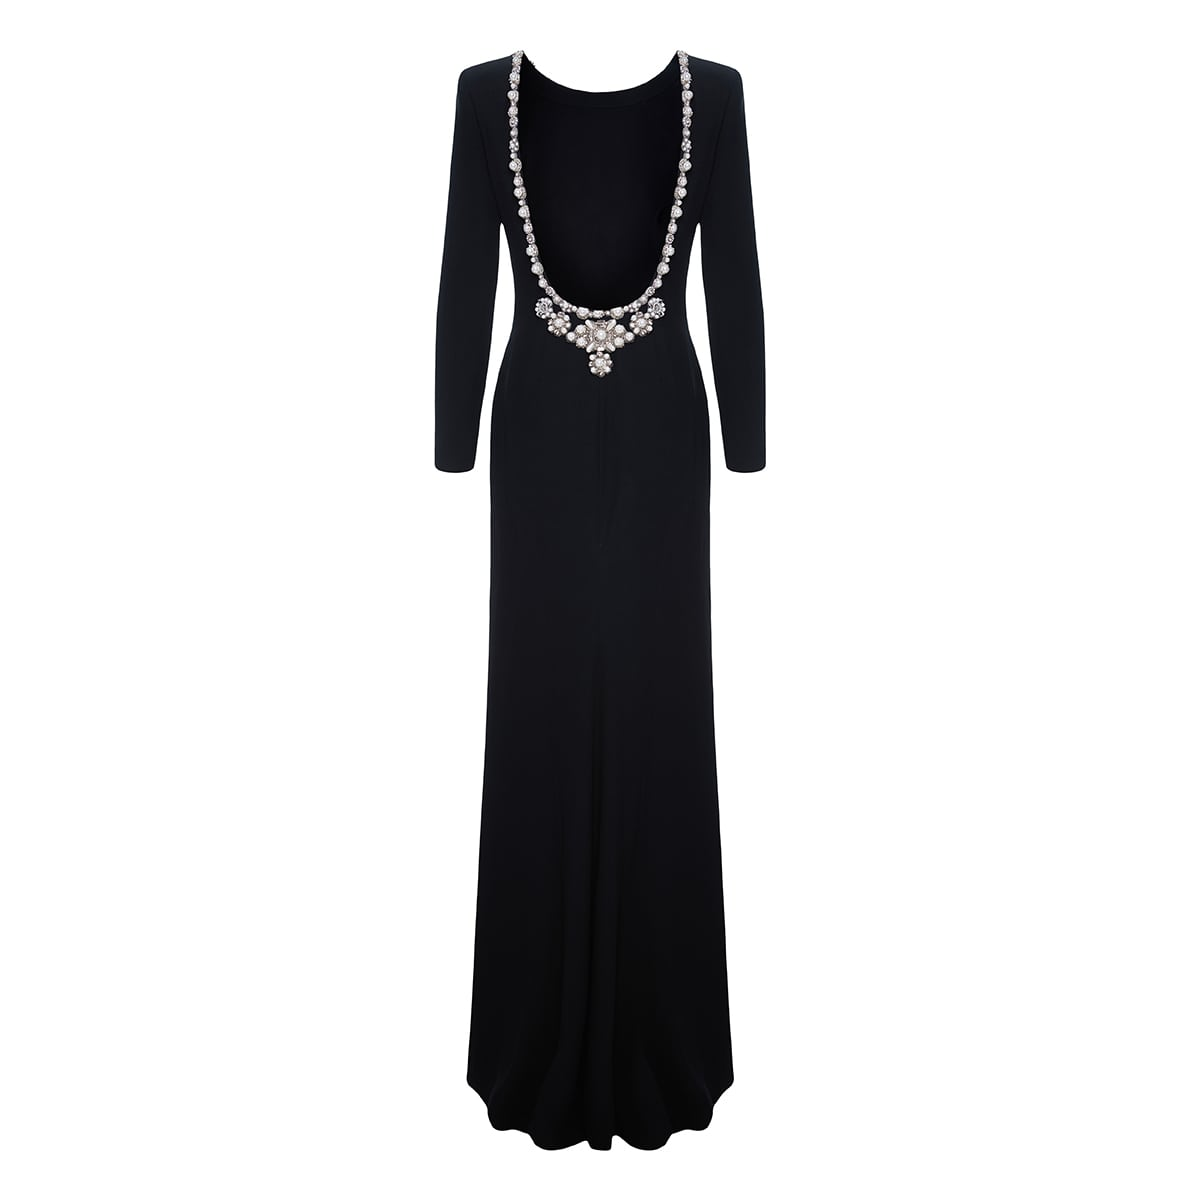 Crystal-embellished open-back gown